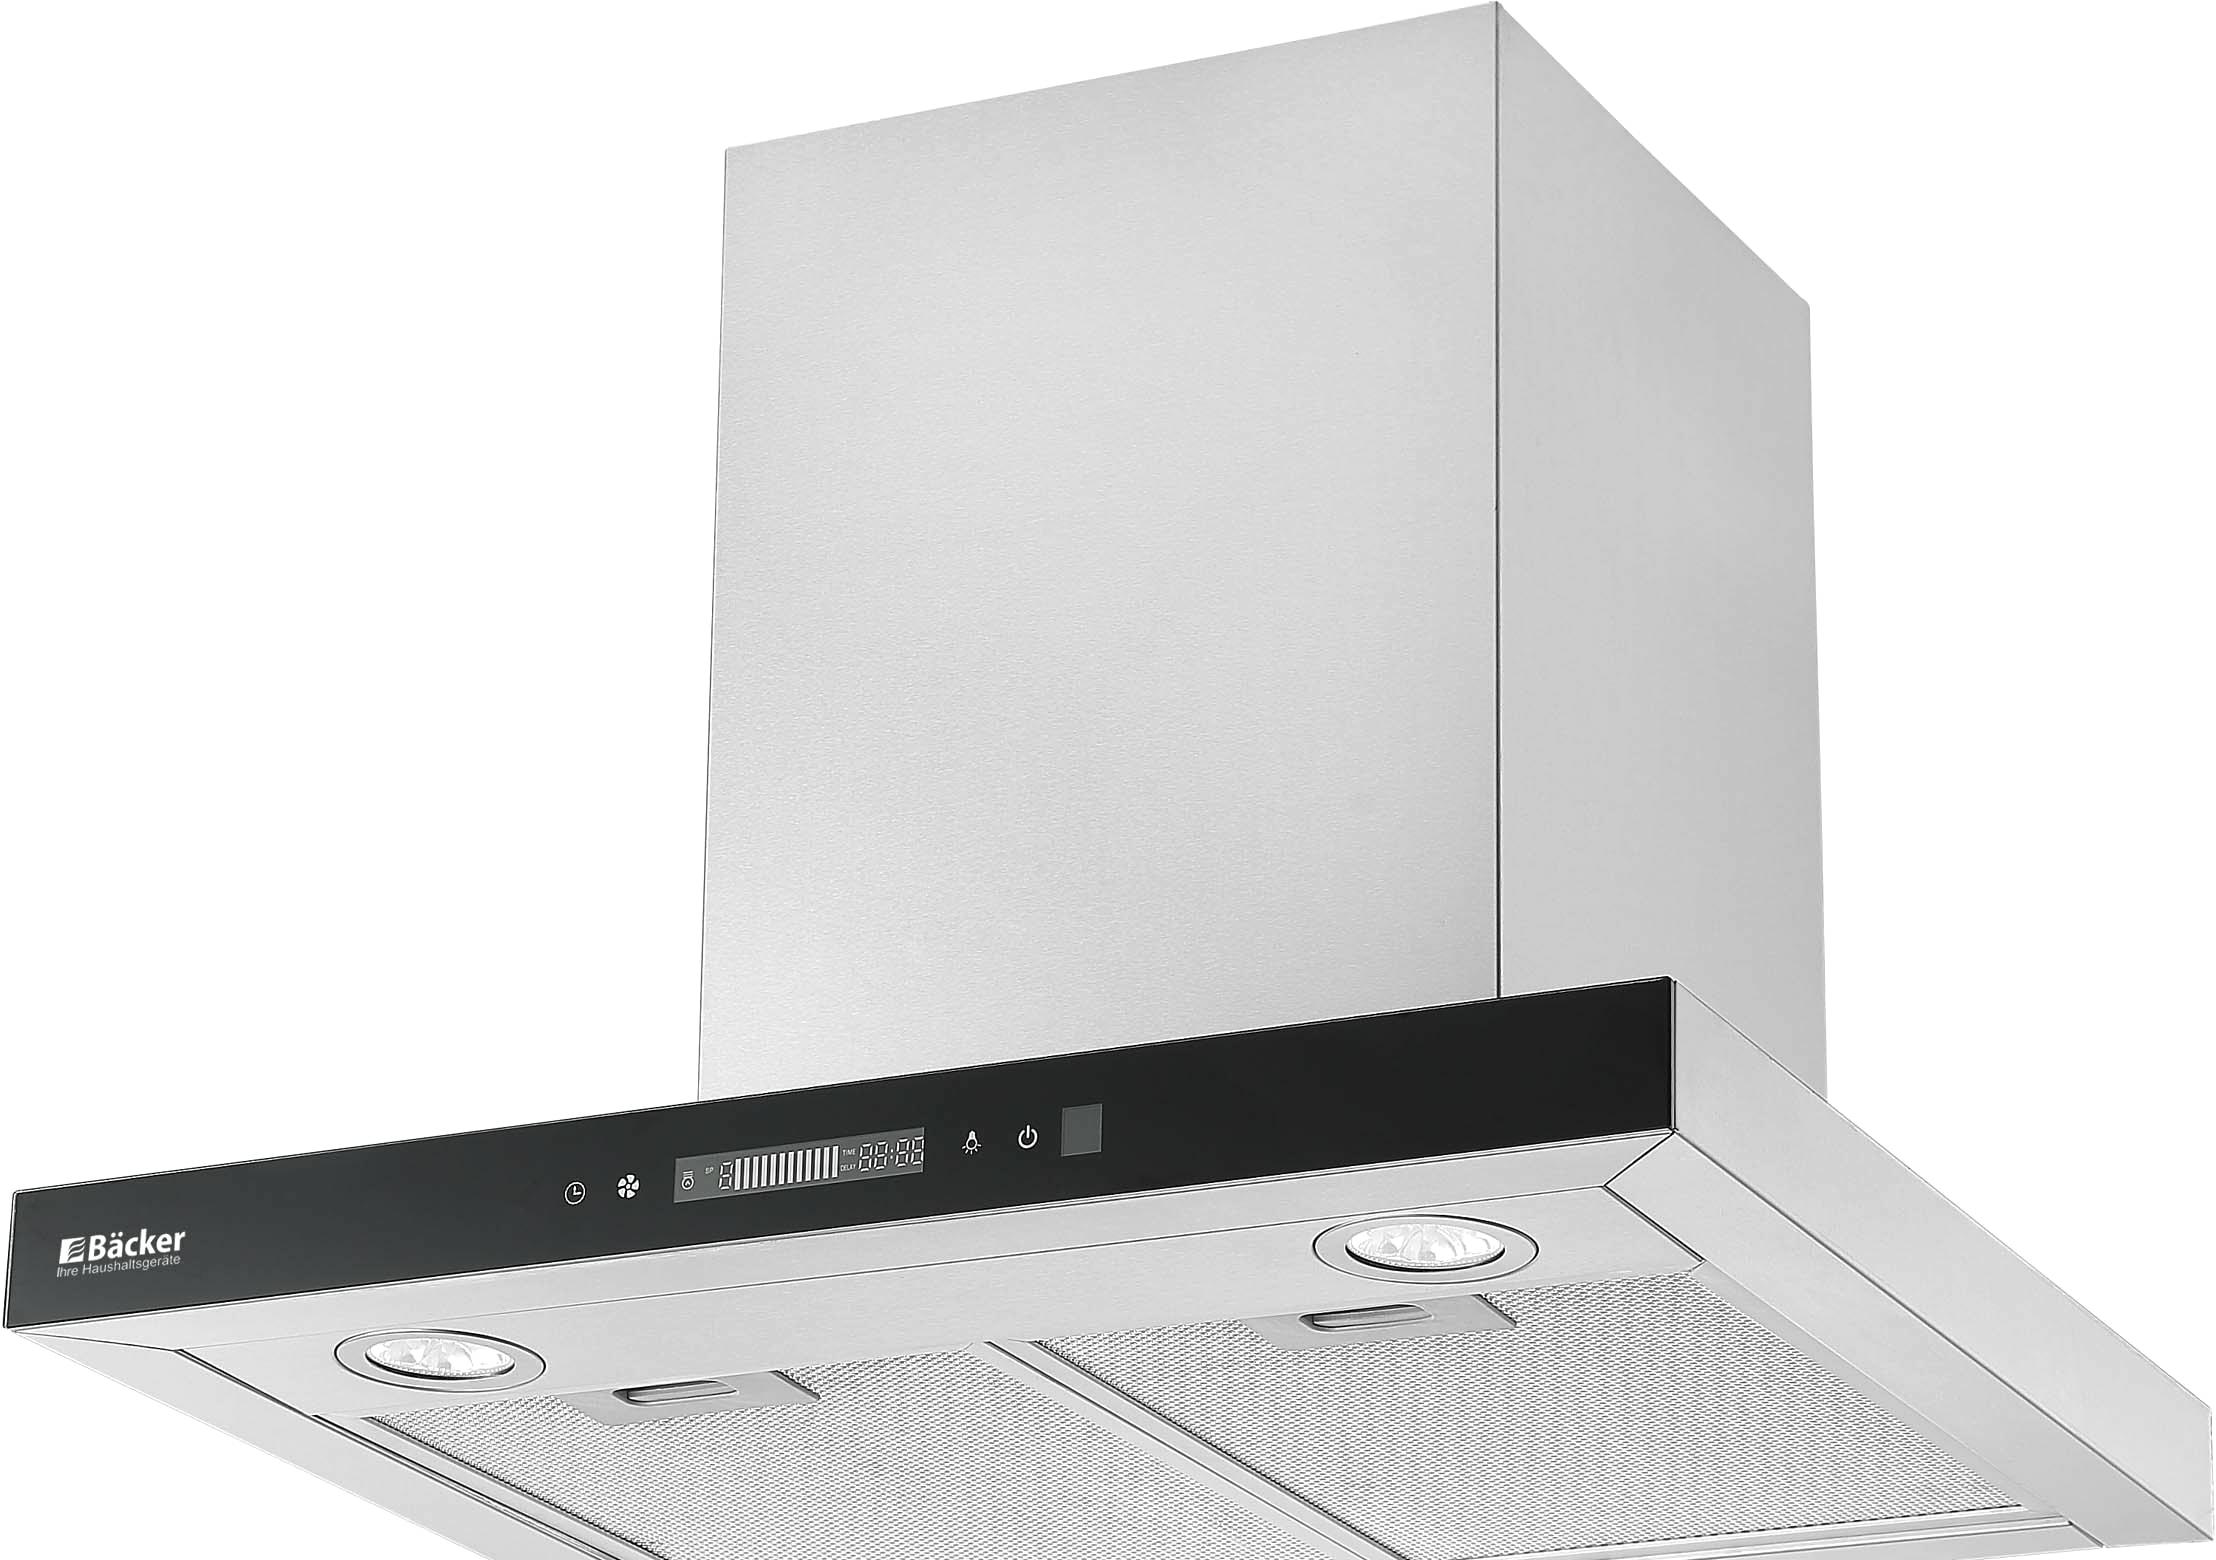 Кухонная вытяжка Backer CH60E-TGL200 SSBK Glass